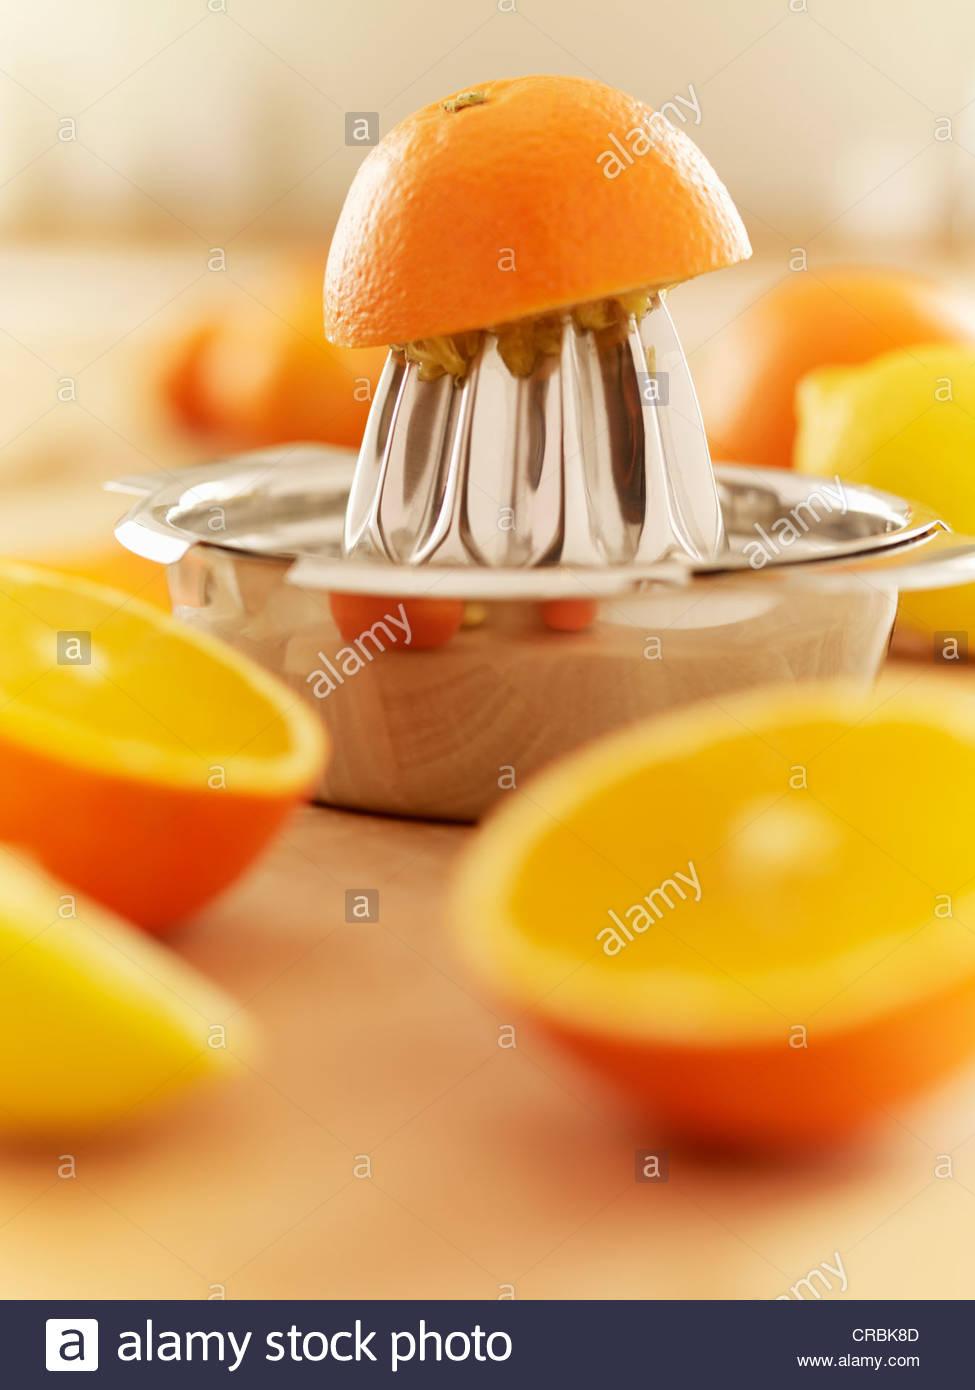 Les oranges et centrifugeuse Photo Stock